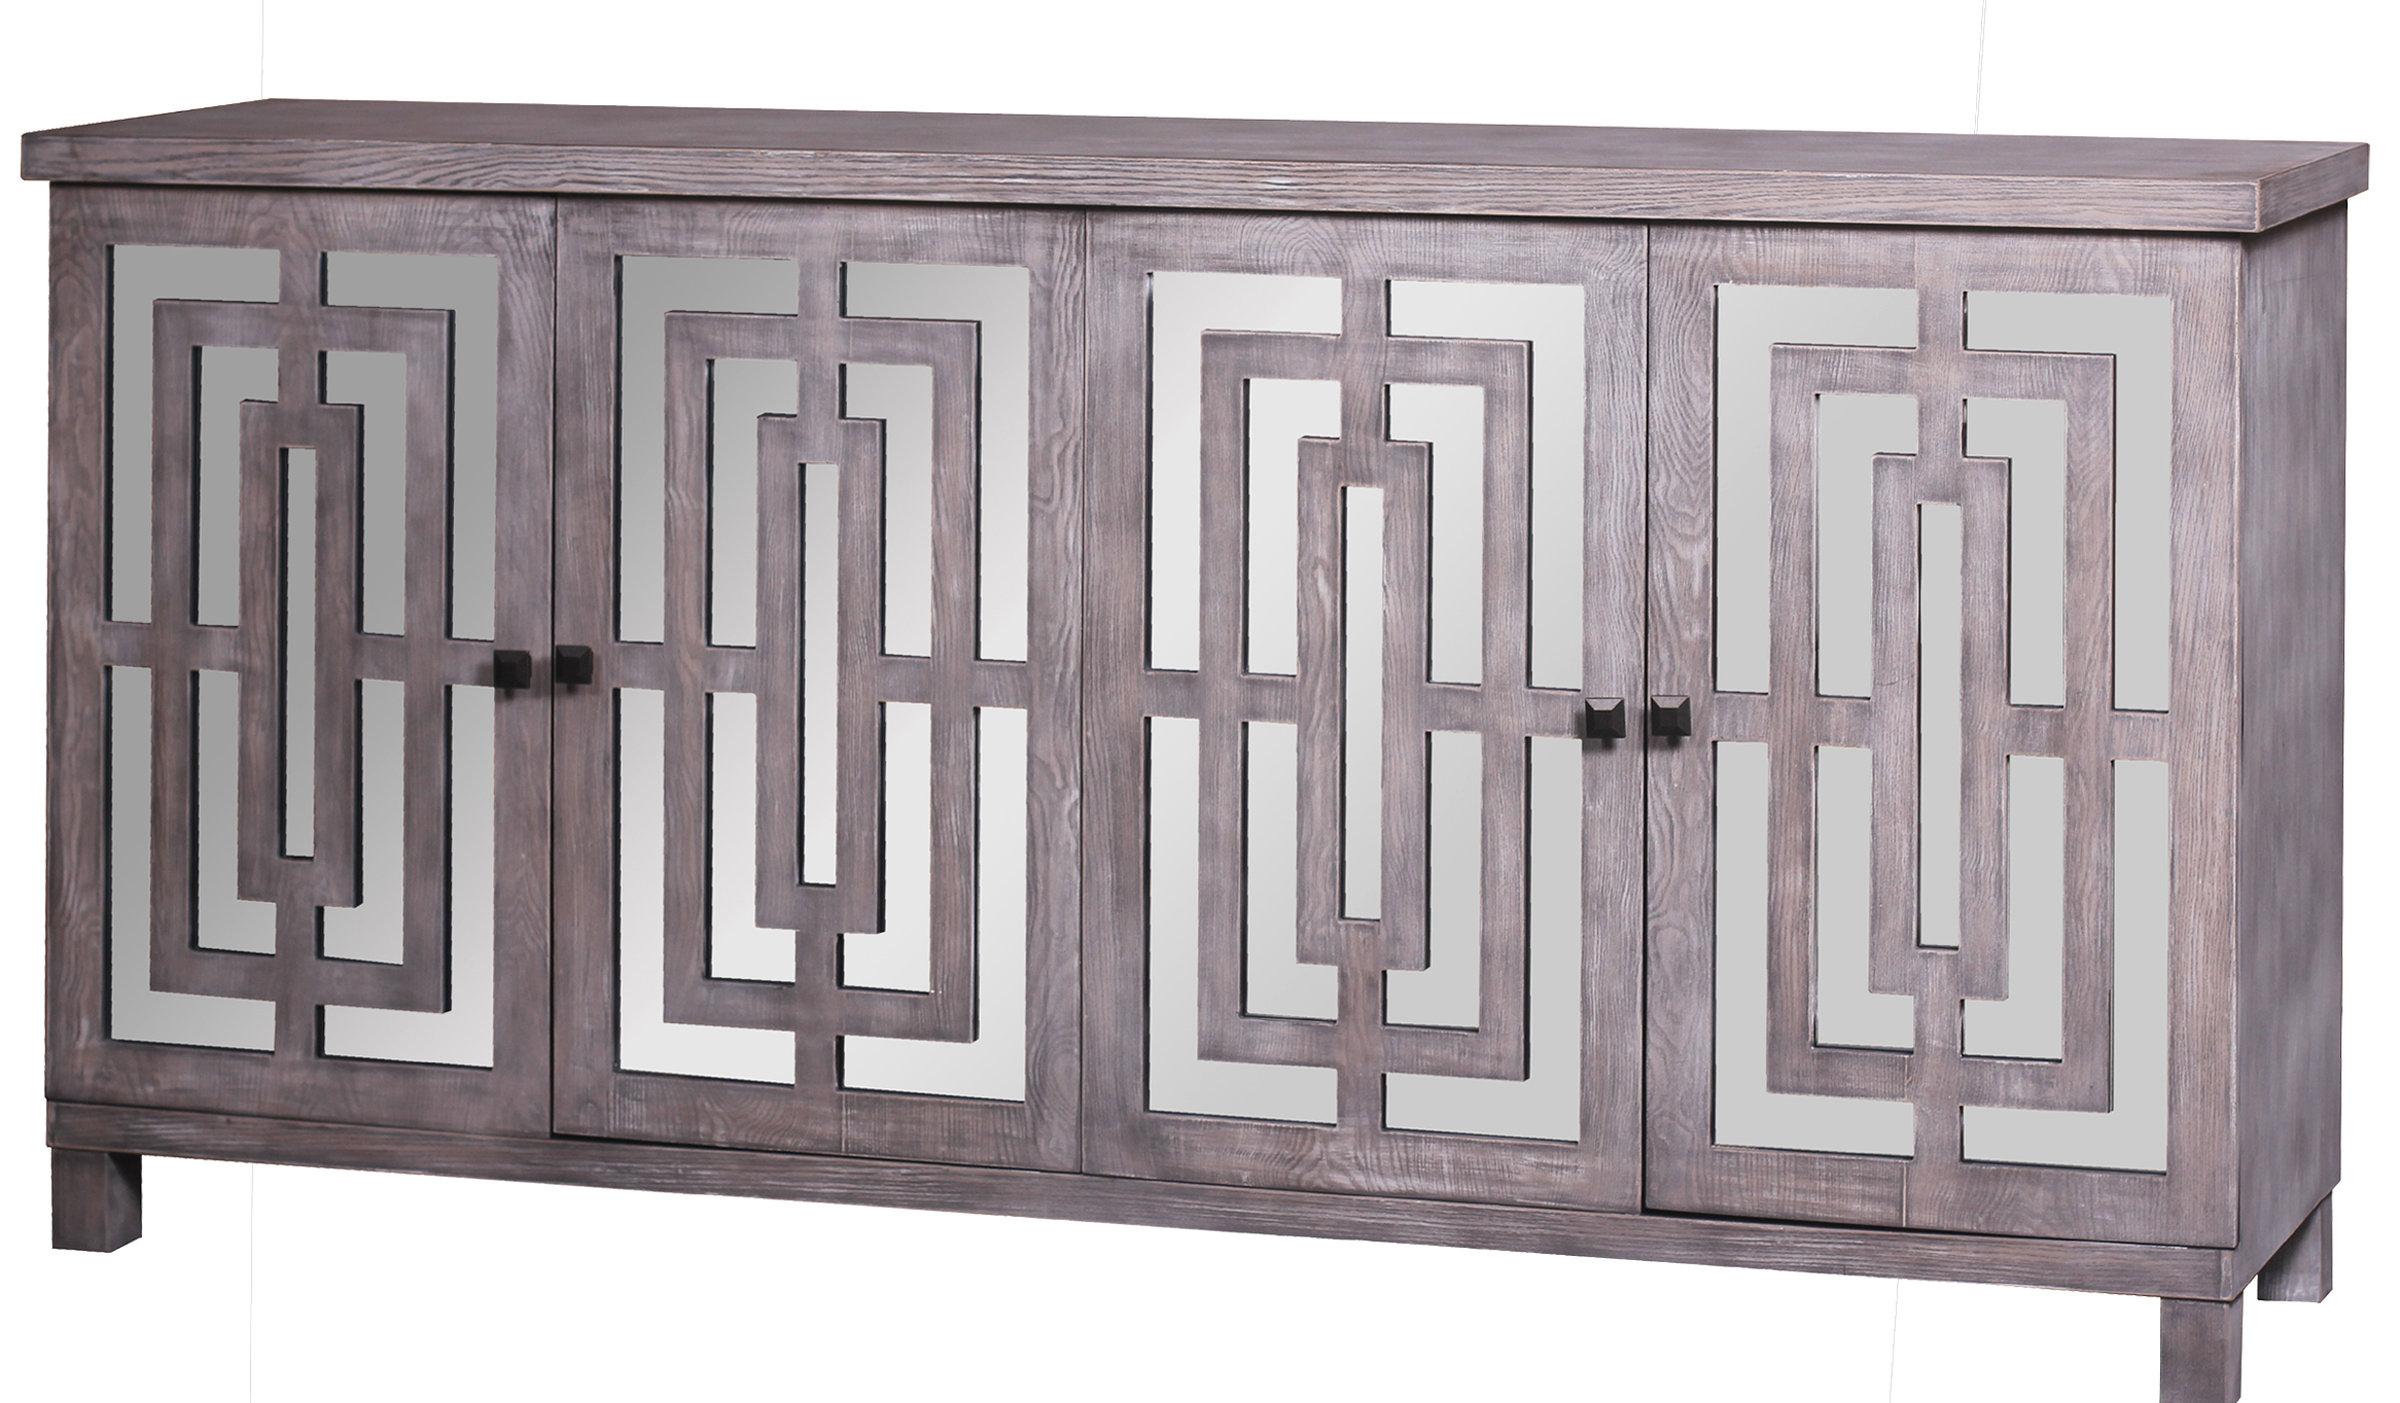 Modern & Contemporary Kieth 4 Door Credenza | Allmodern Throughout Latest Kattie 4 Door Cabinets (View 13 of 20)